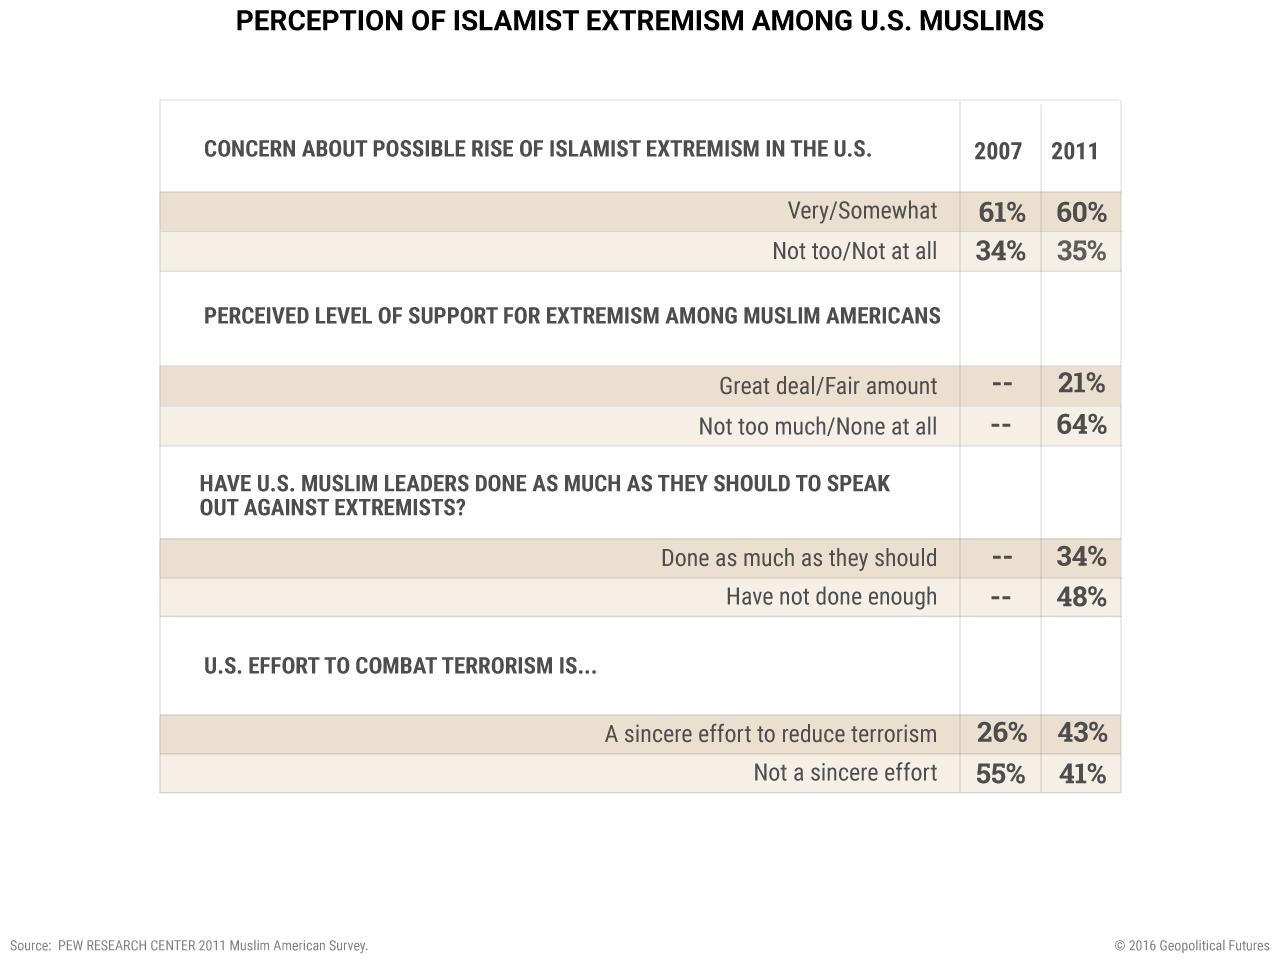 Perception-of-Islamist-Extremism-Among-U.S.-Muslims